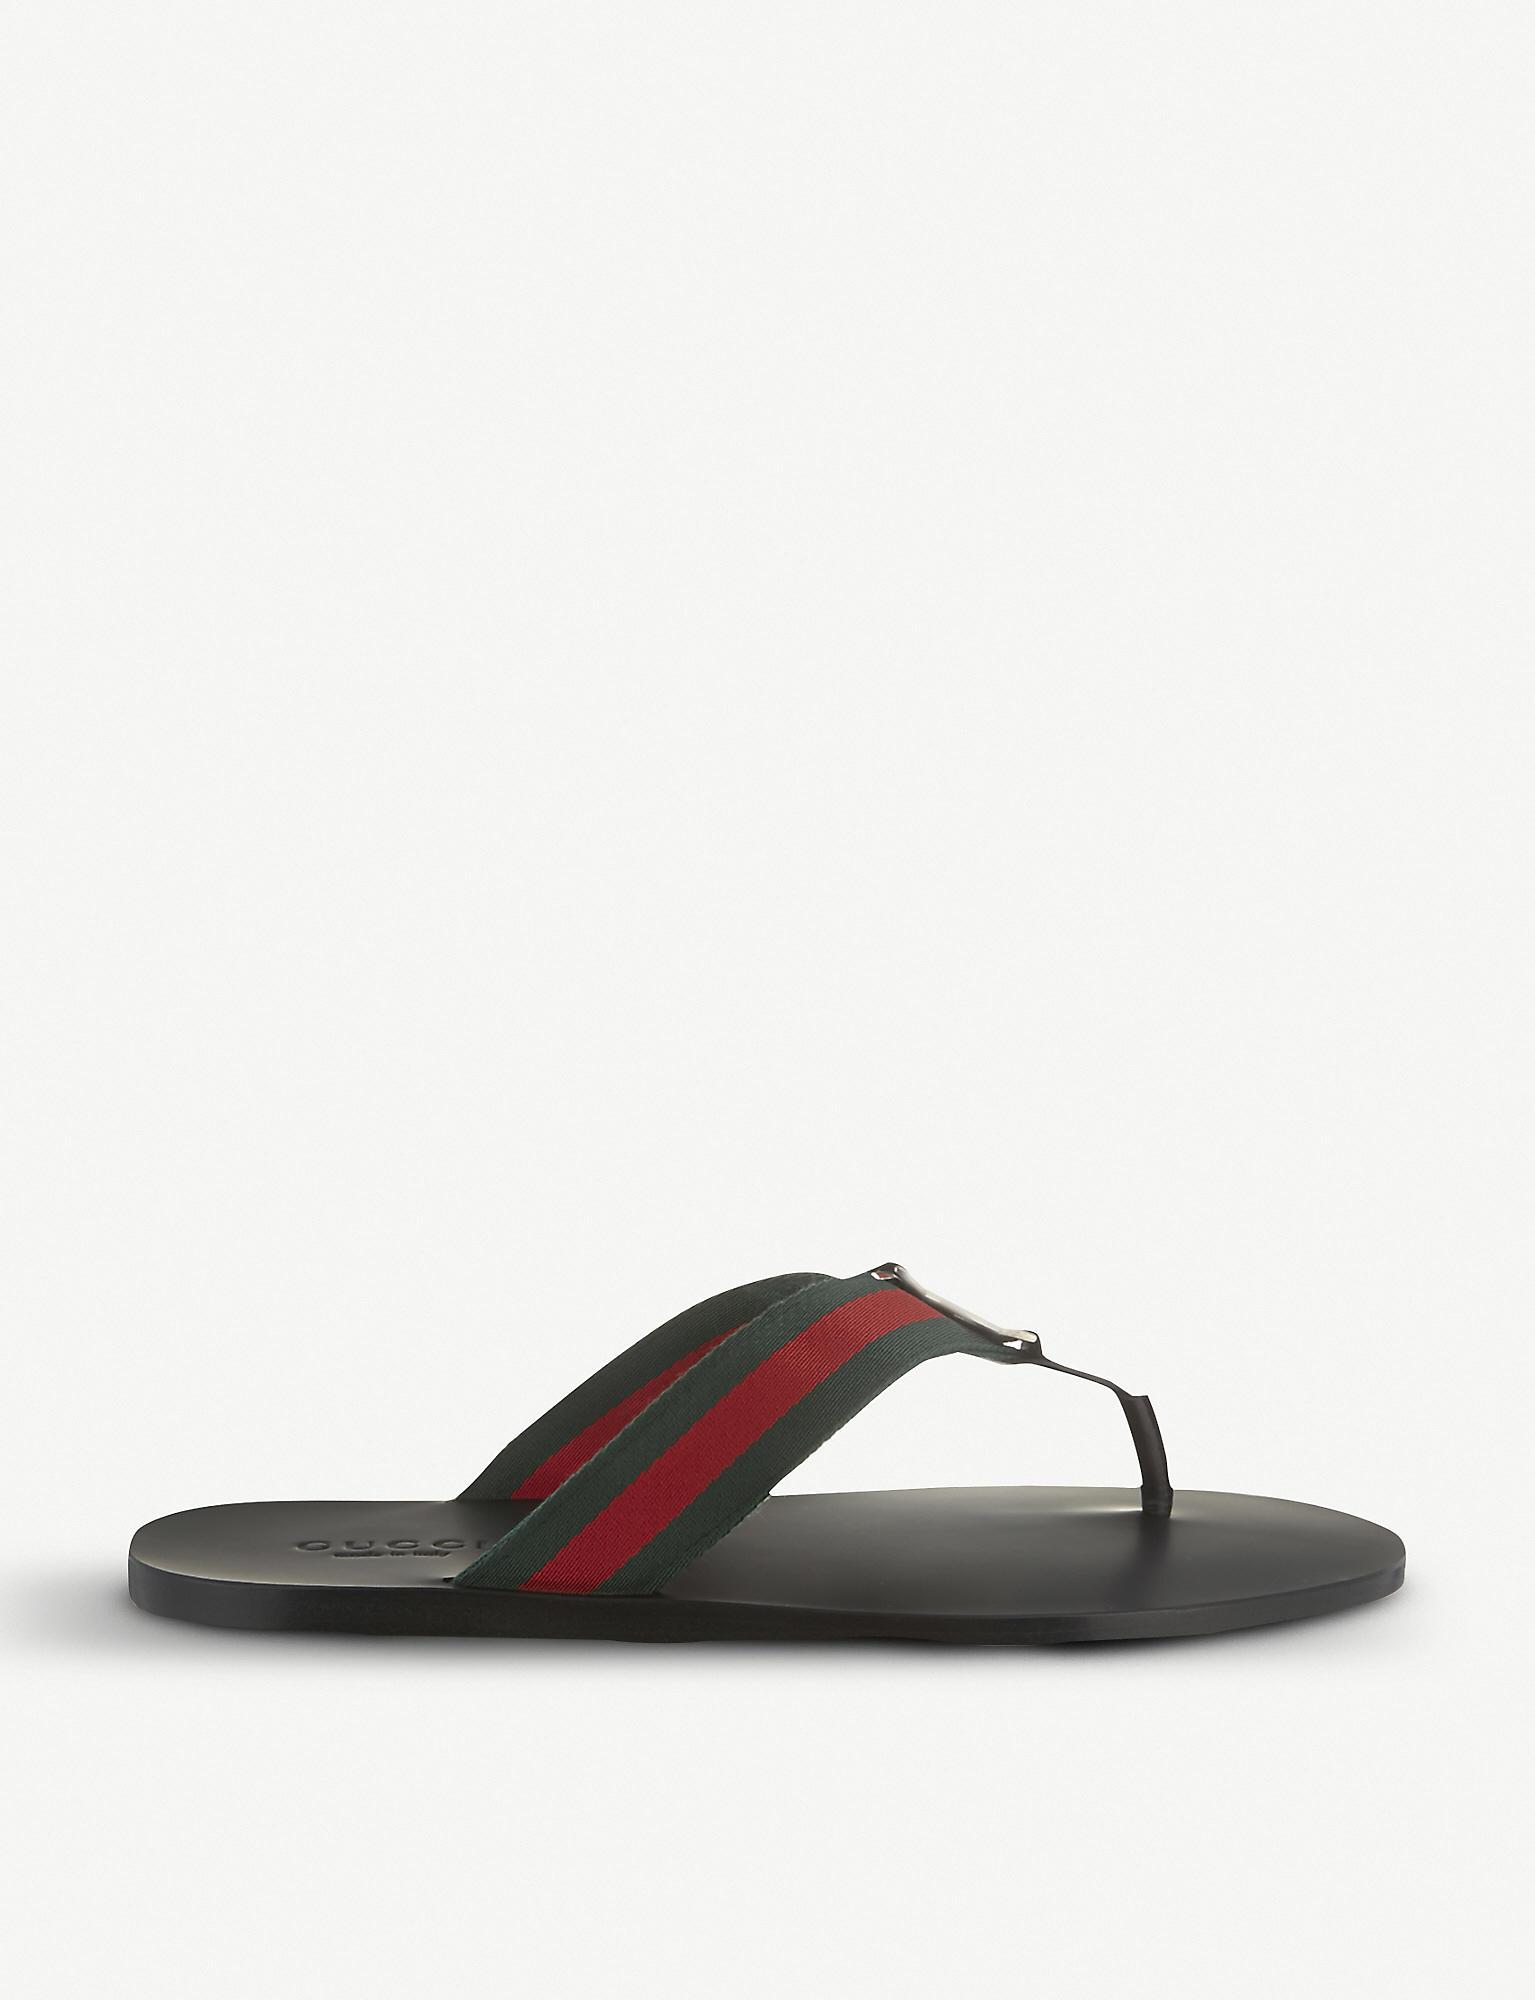 c743762eab6d Lyst - Gucci Web Flip-flops in Black for Men